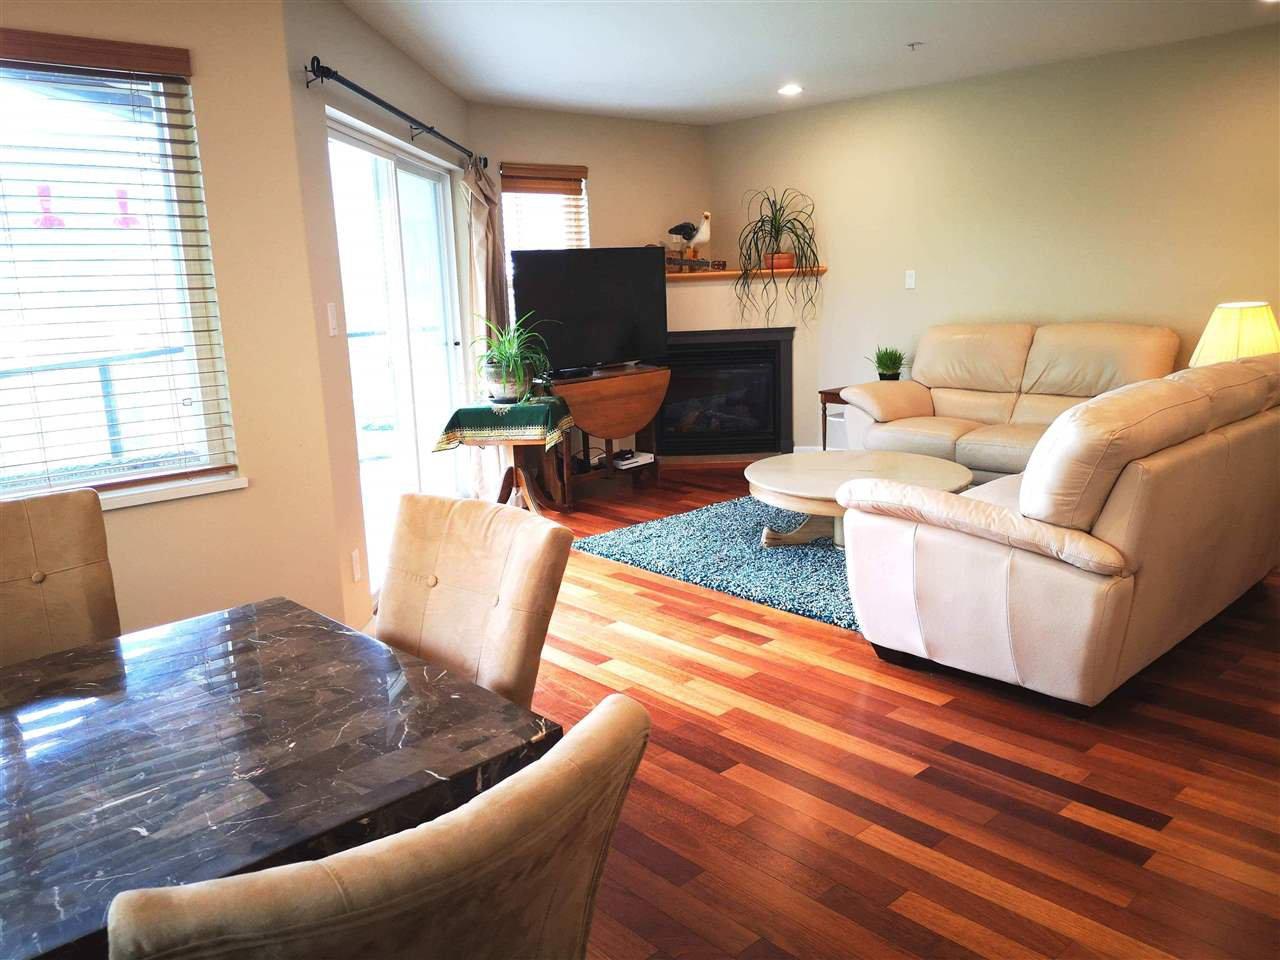 "Photo 4: Photos: W201 5780 TRAIL Avenue in Sechelt: Sechelt District Condo for sale in ""THE BLUFF"" (Sunshine Coast)  : MLS®# R2409652"